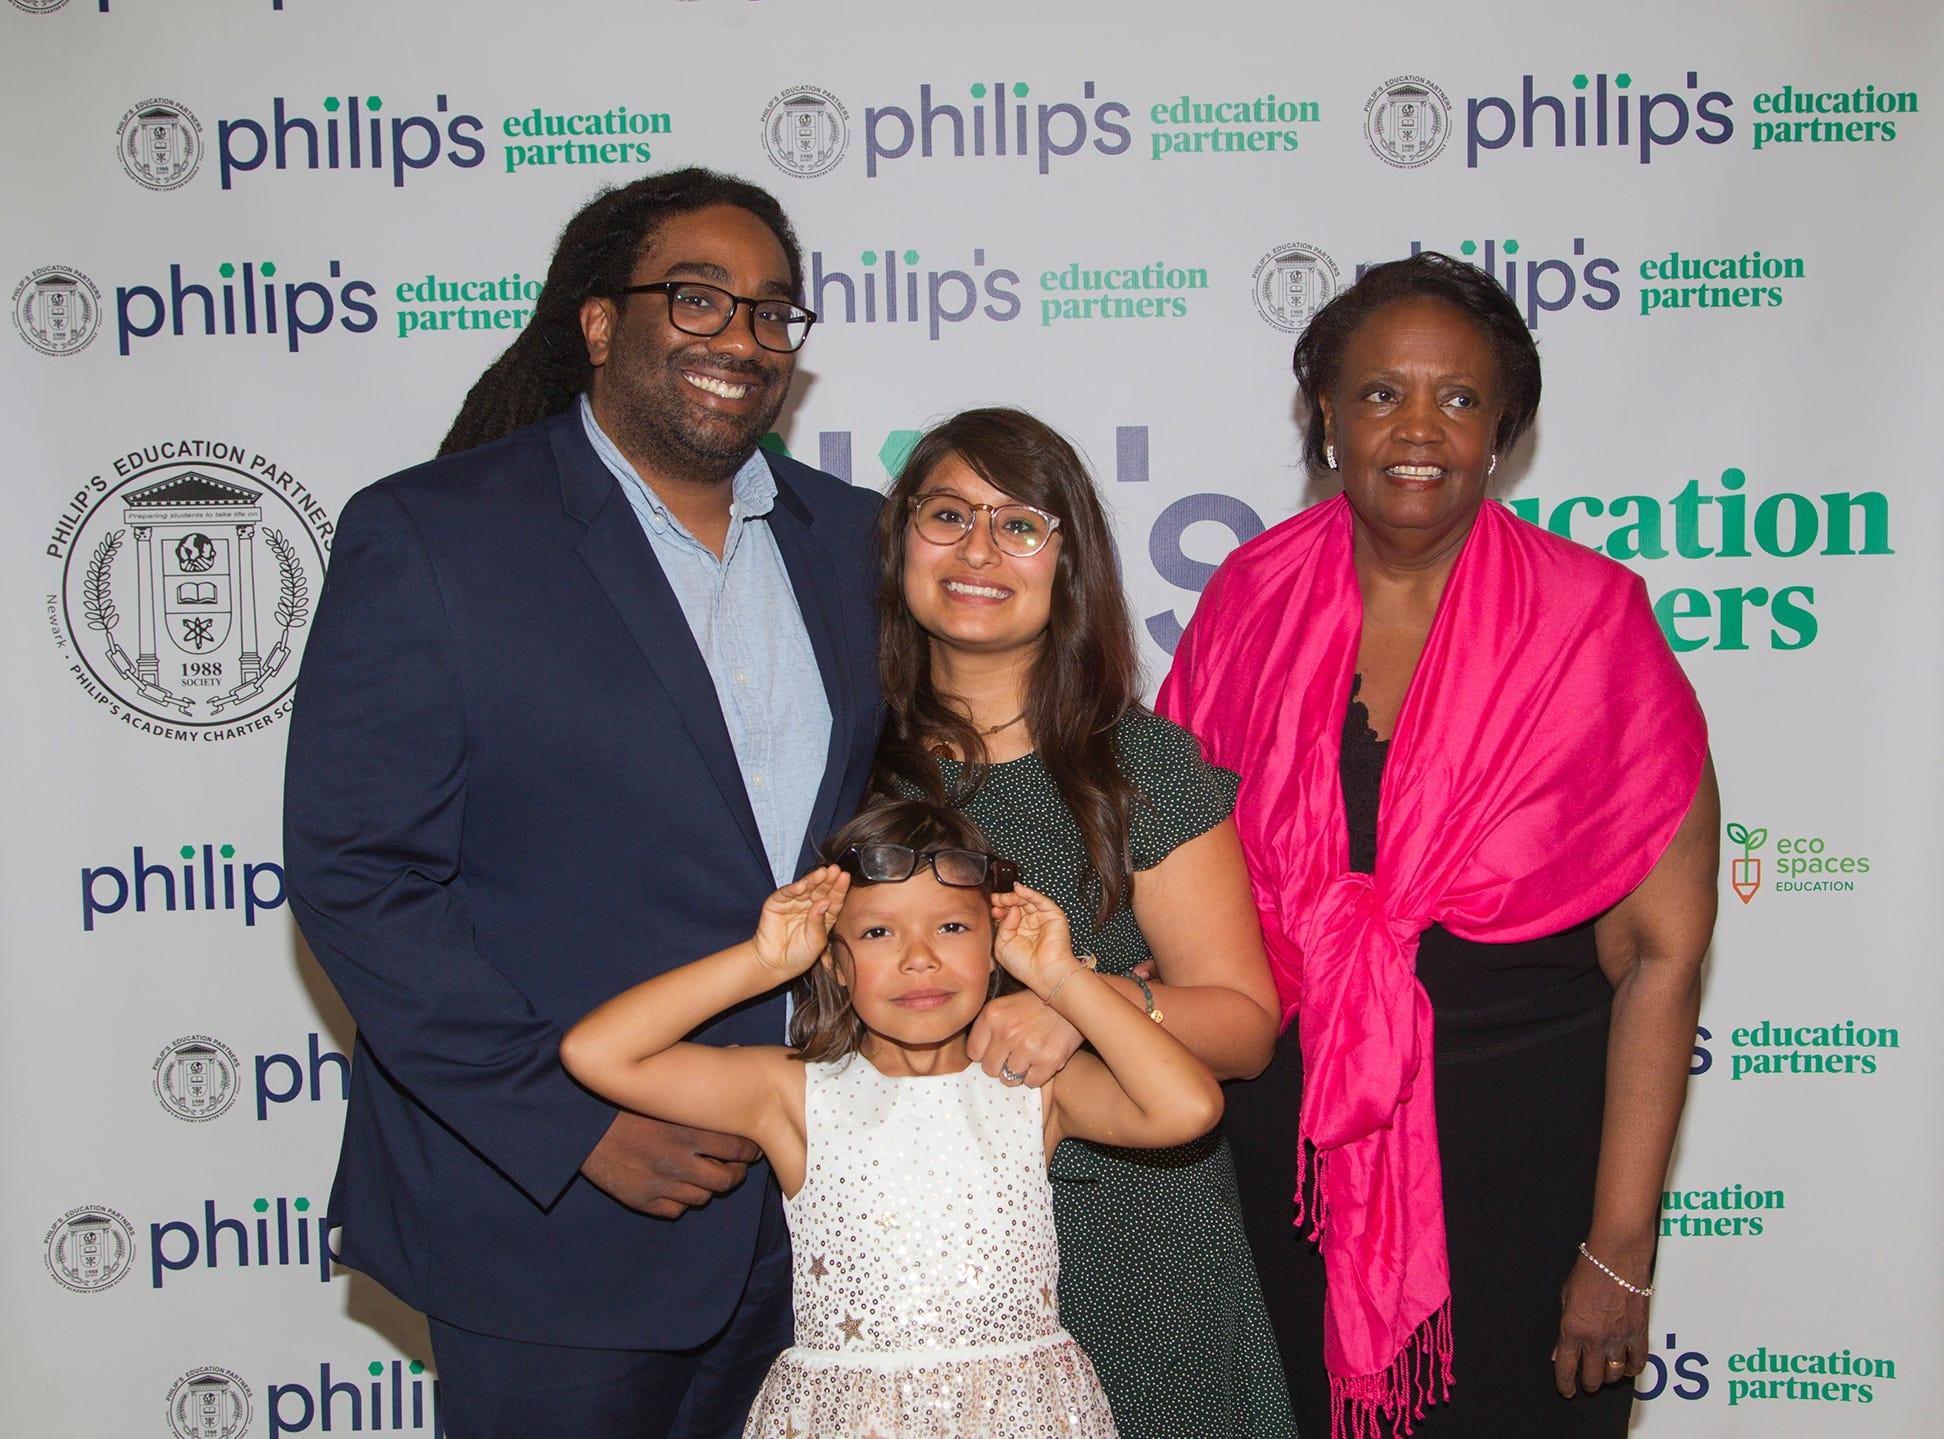 The Hooper family. Philip's Education Partners host The Dream Maker 30th anniversary gala at The Mezzanine in Newark 3/29/2019.